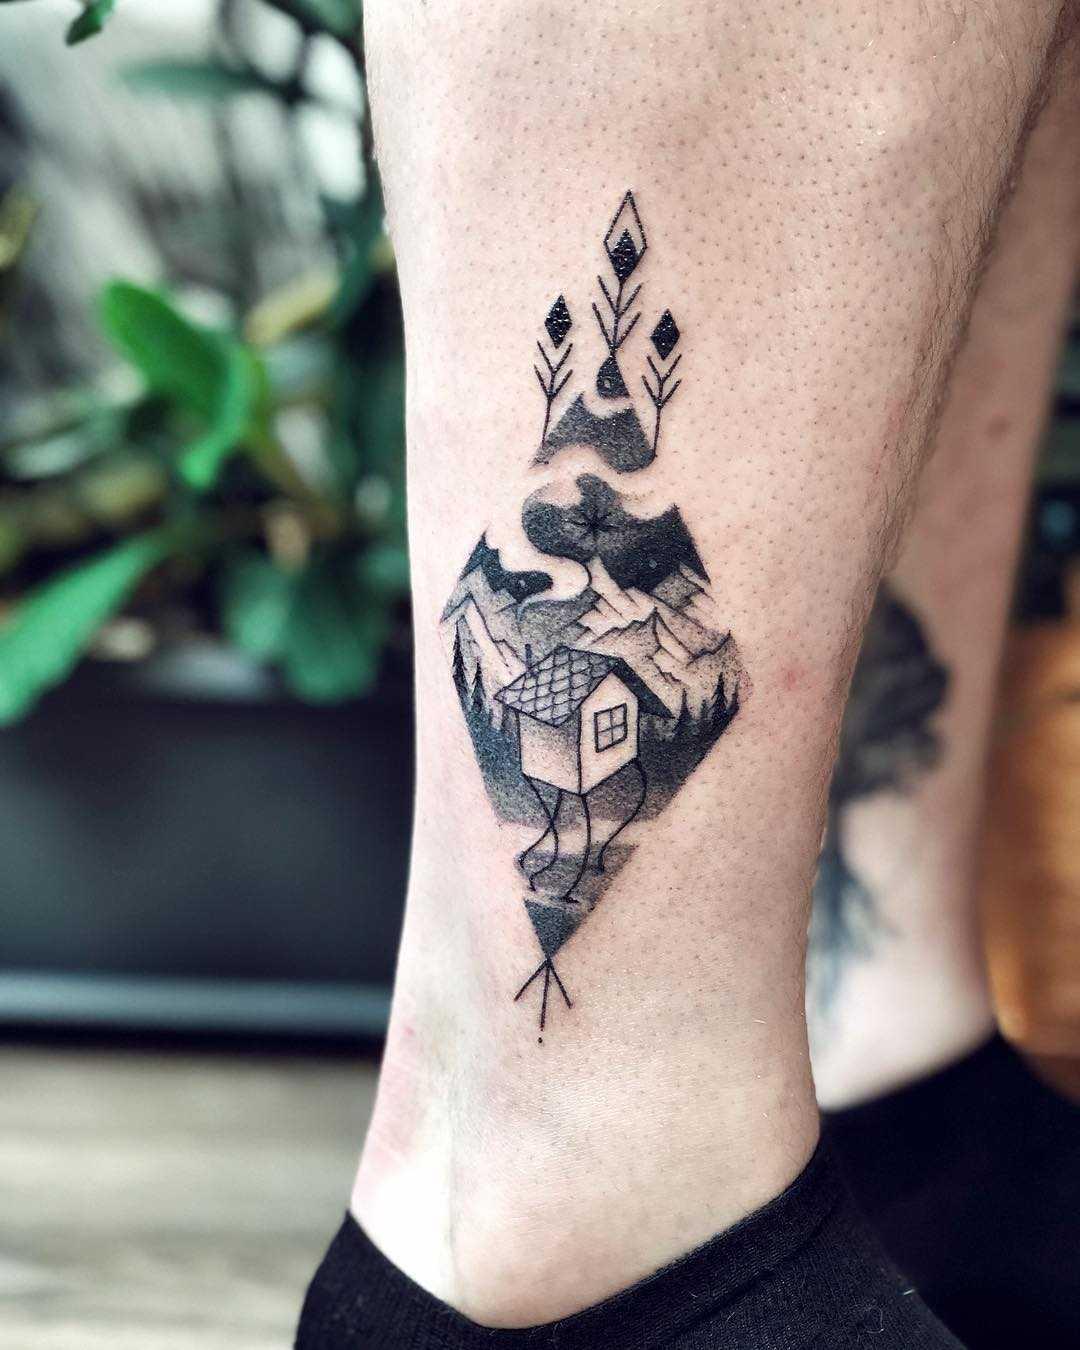 Triangular landscape on the calf by Sasha Tattooing